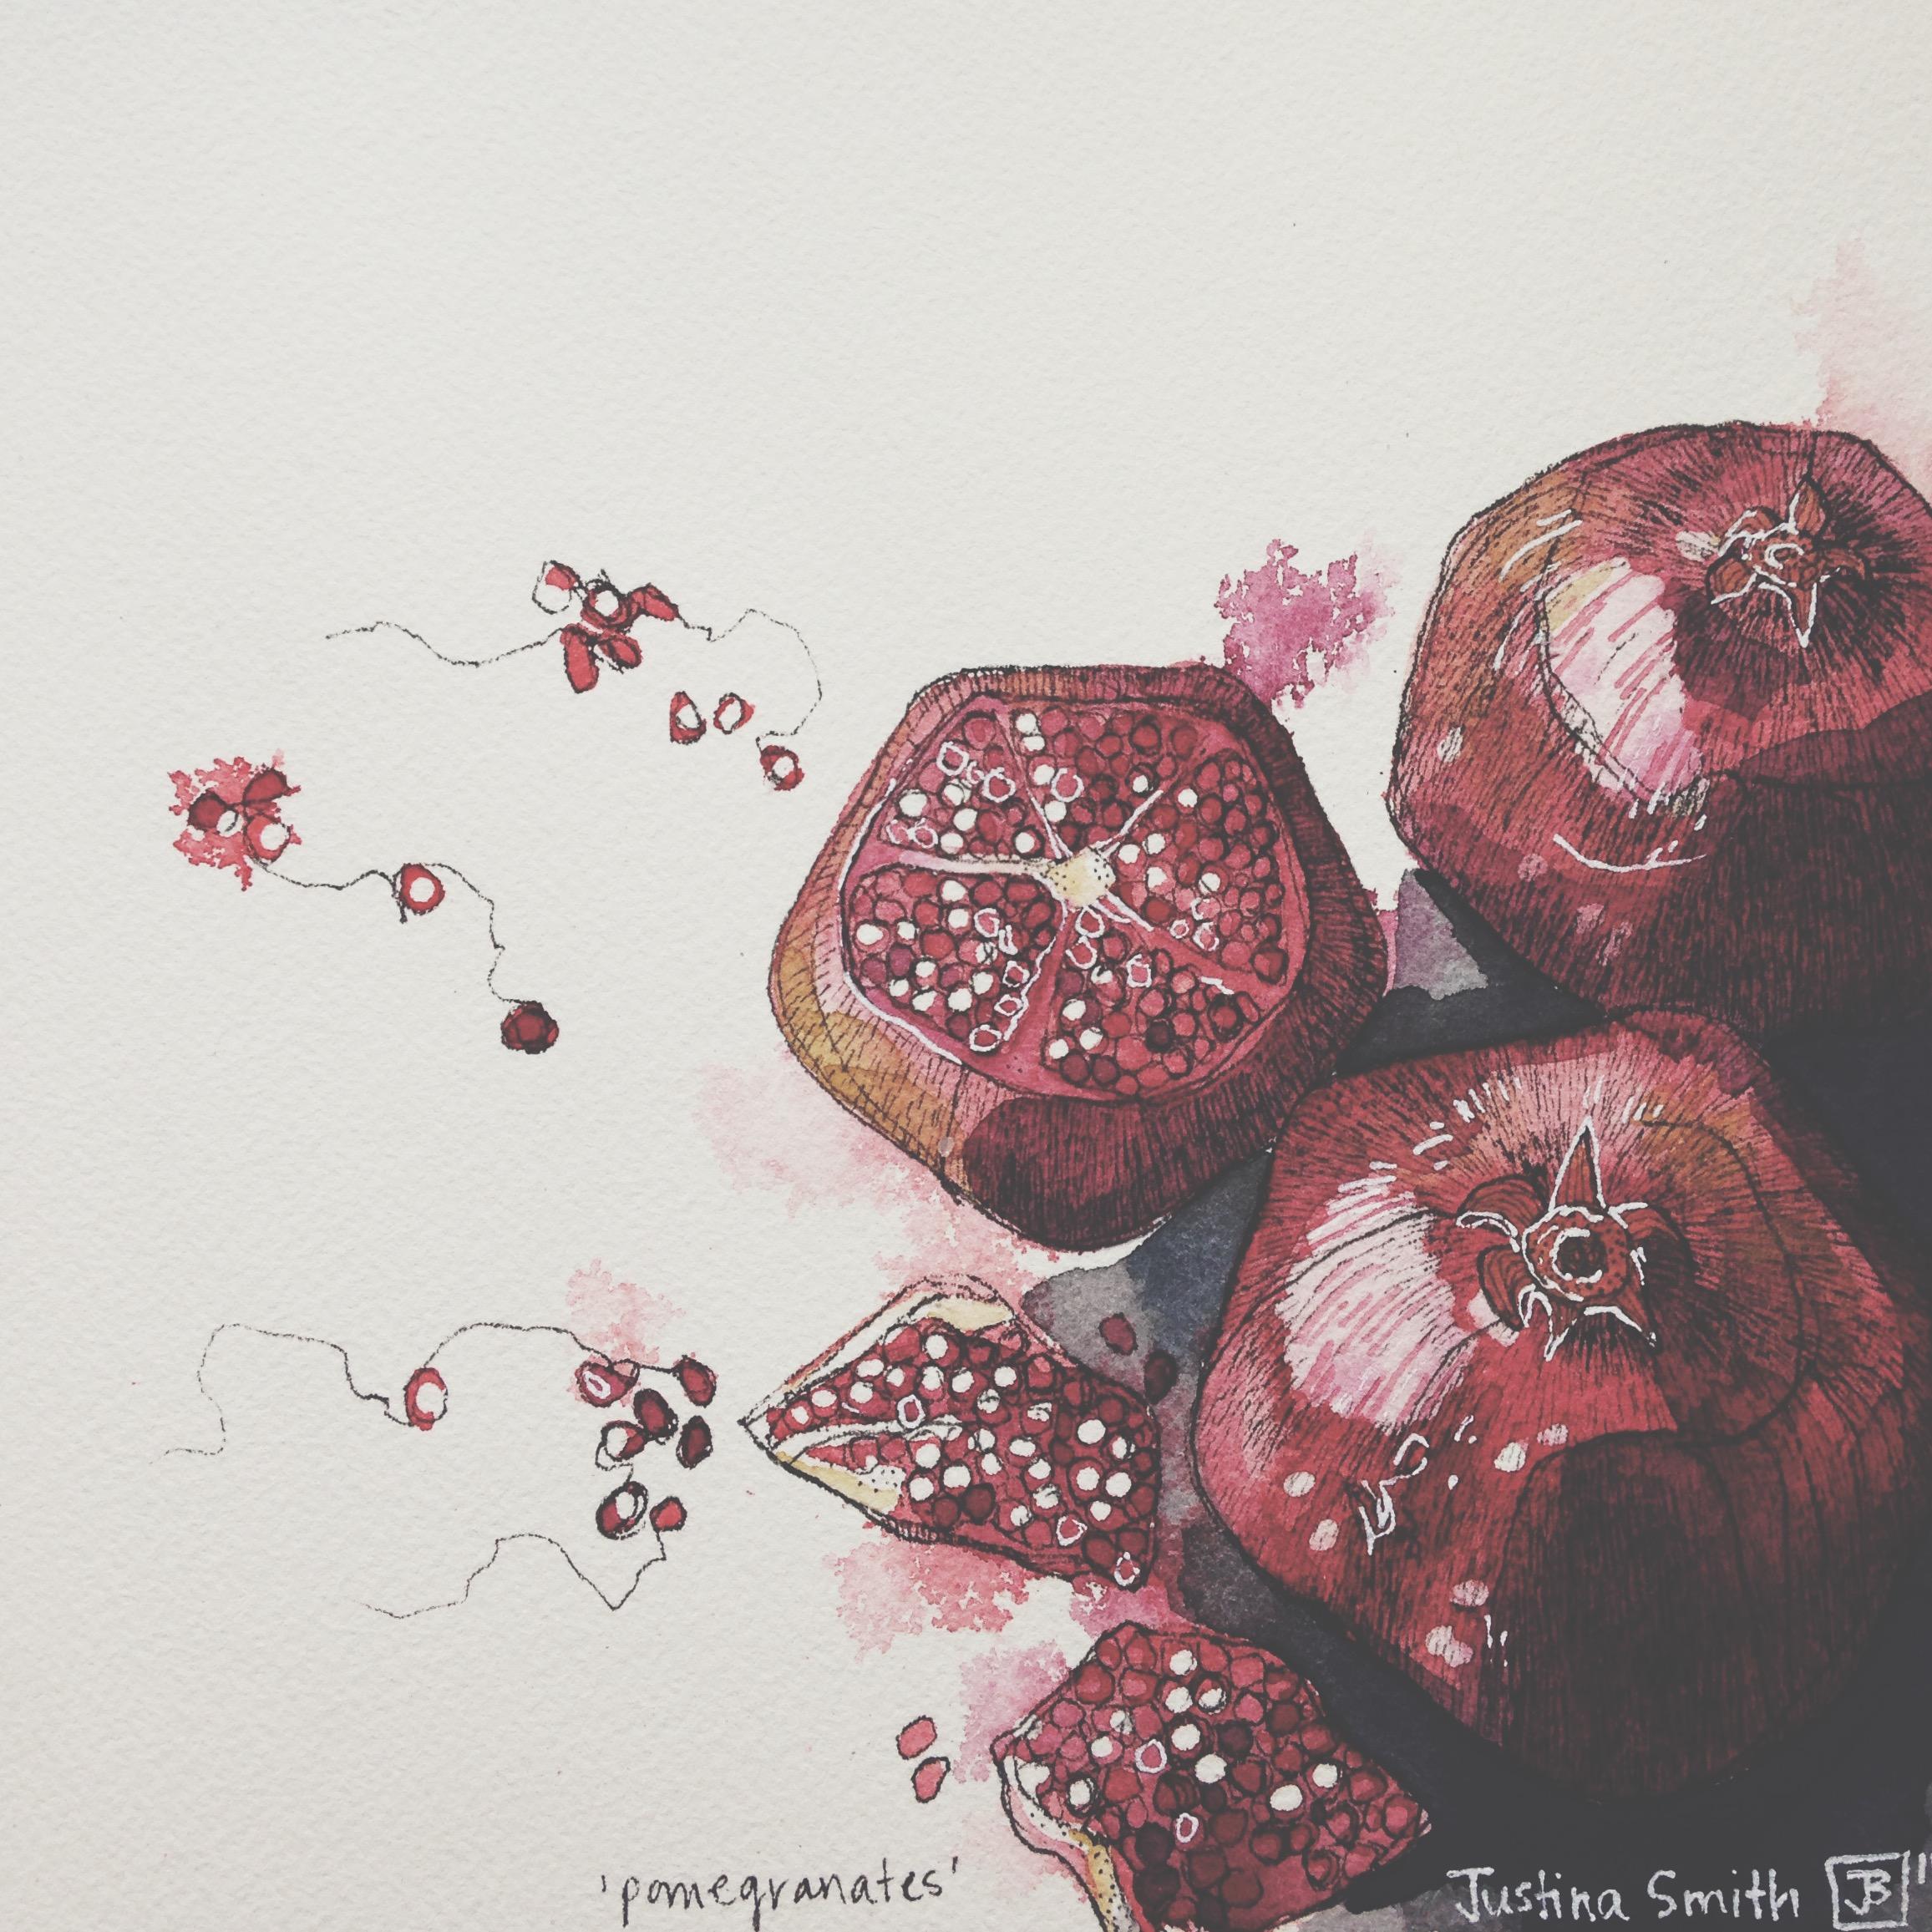 pomegranates, pen & watercolour on cold pressed paper, 8x8(in), SOLD, 2016